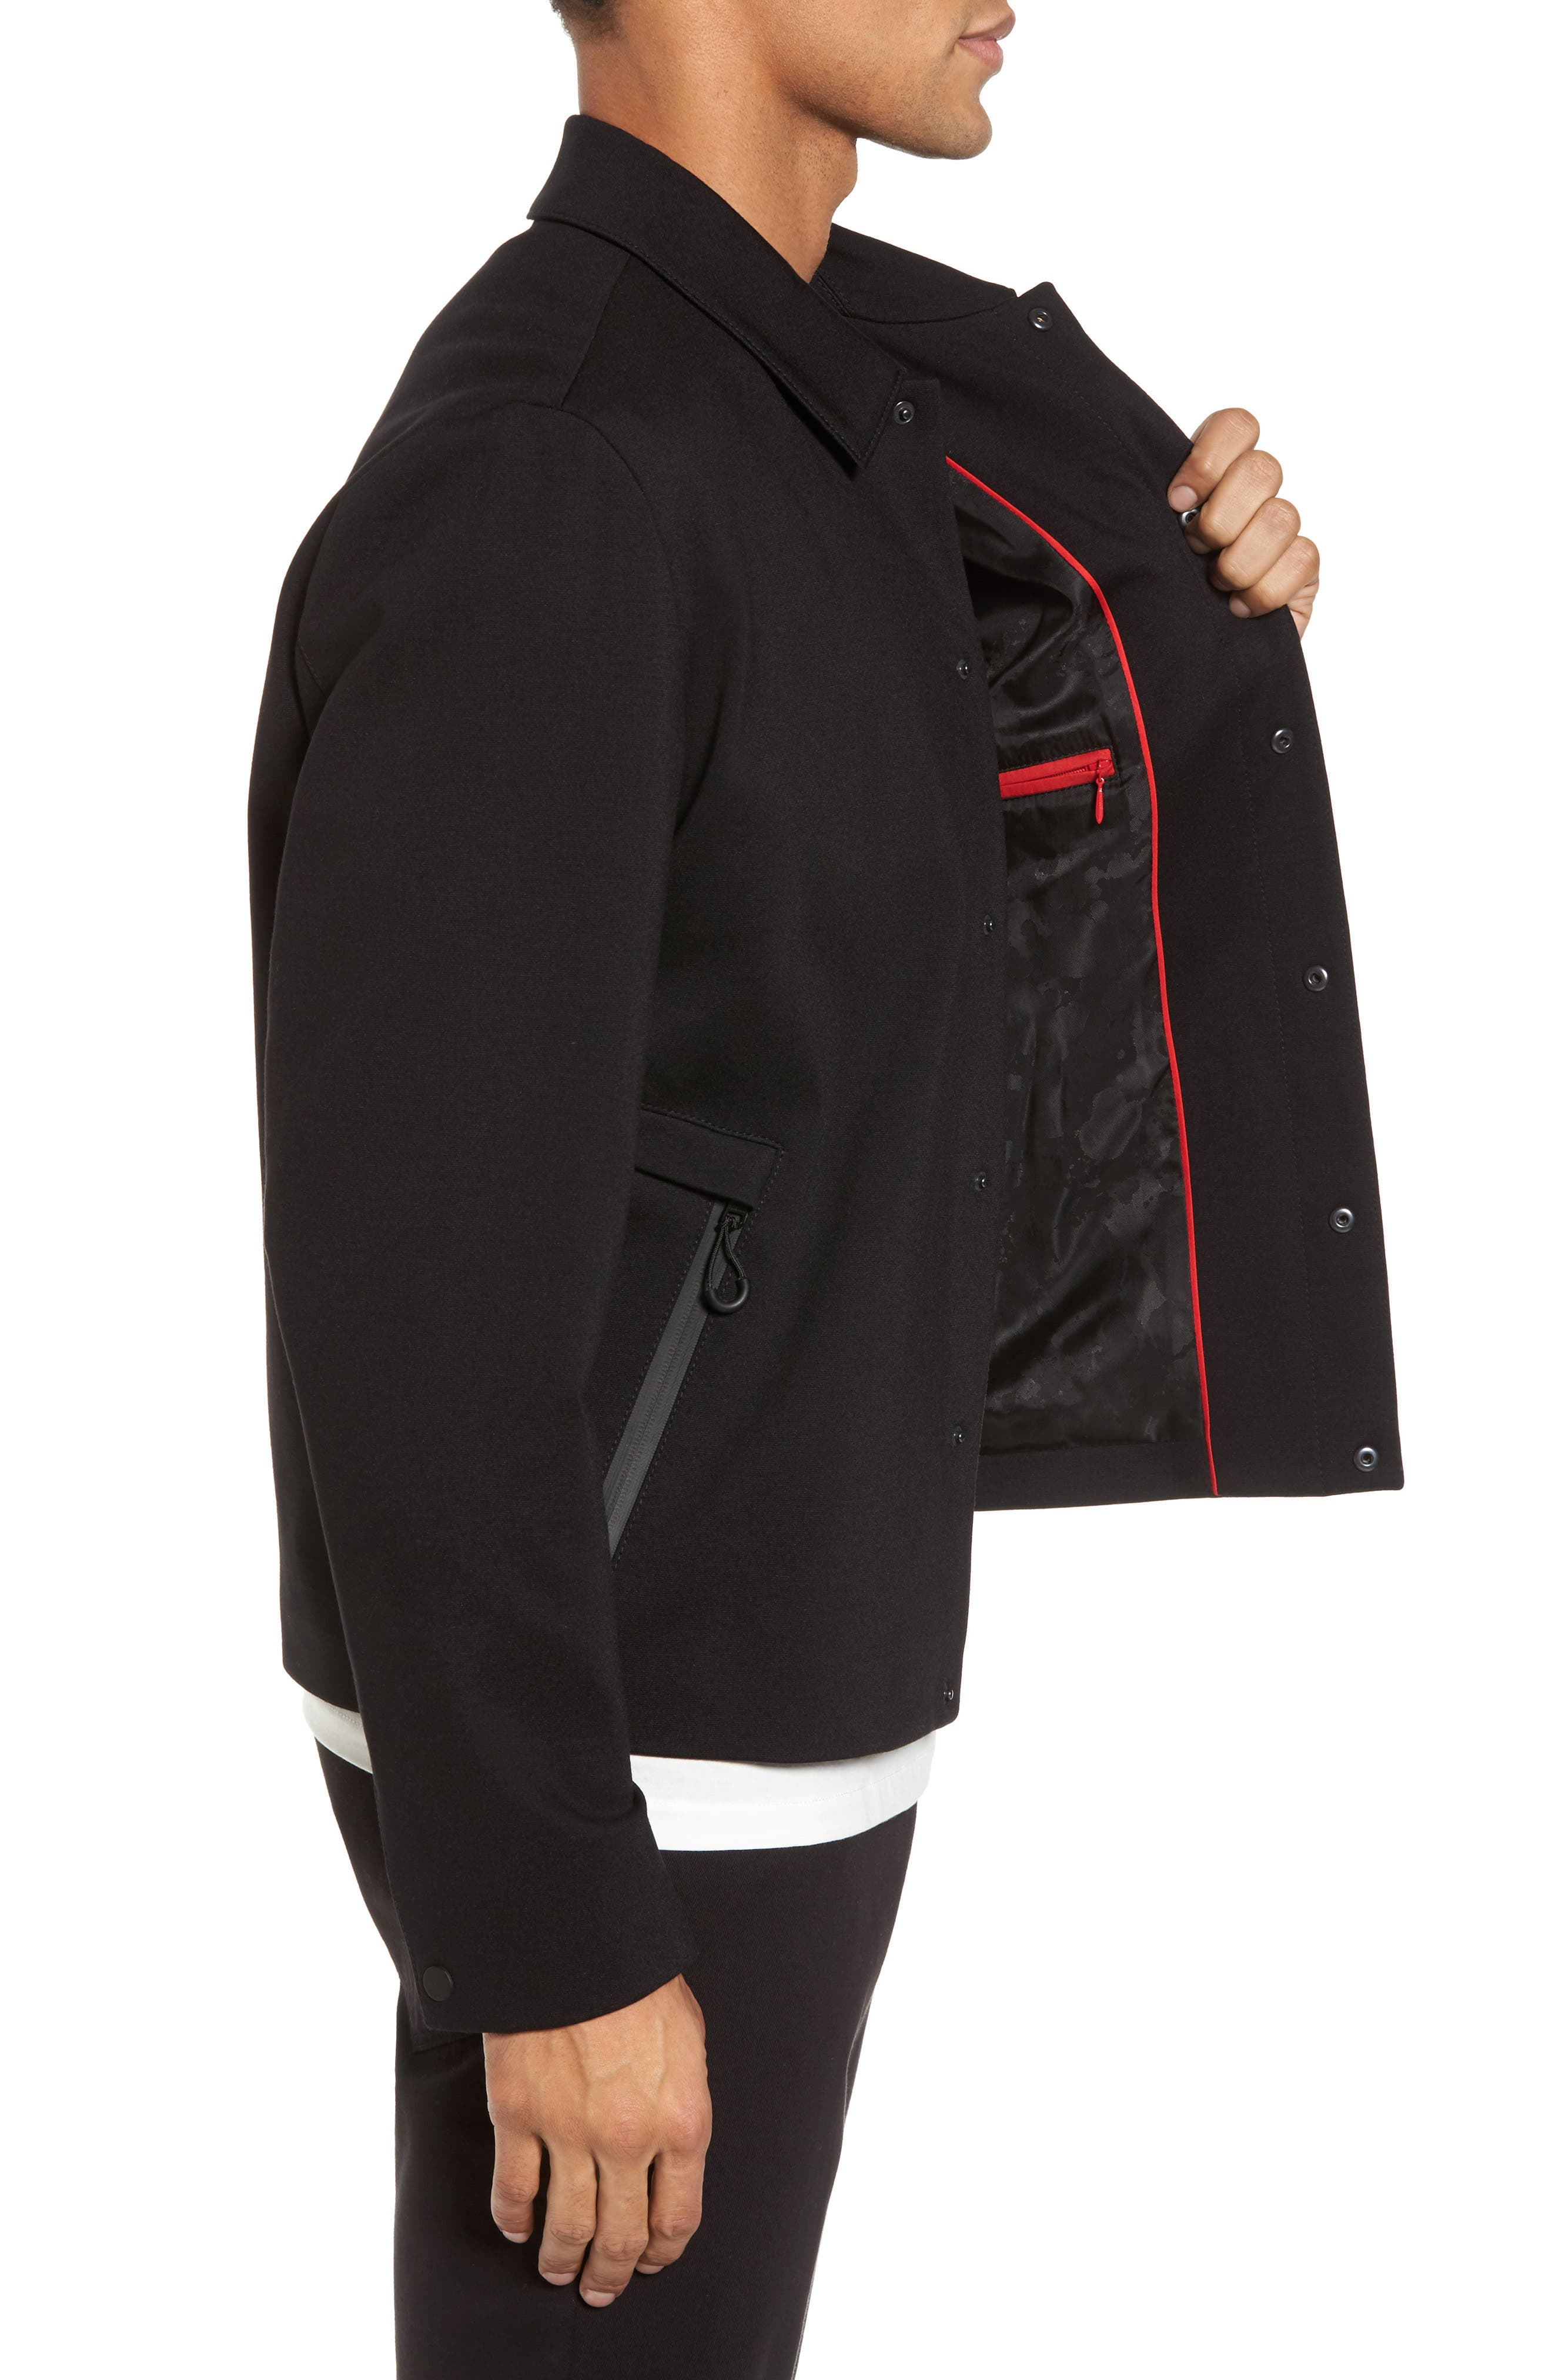 Hugo Boss Babenu Shirt Jacket,                             Alternate thumbnail 3, color,